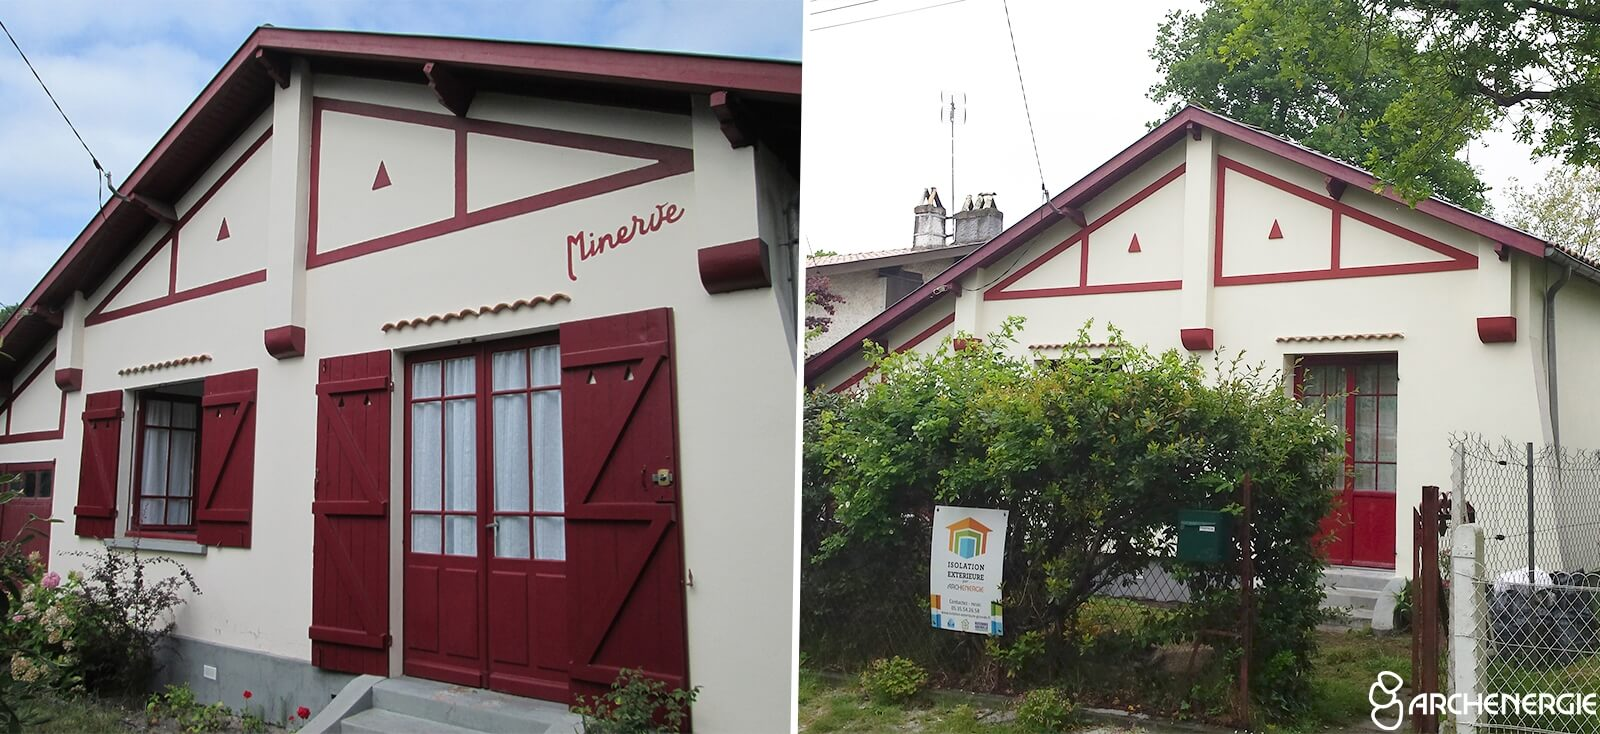 maison andernos gironde 33 - travaux d'isolation extérieure